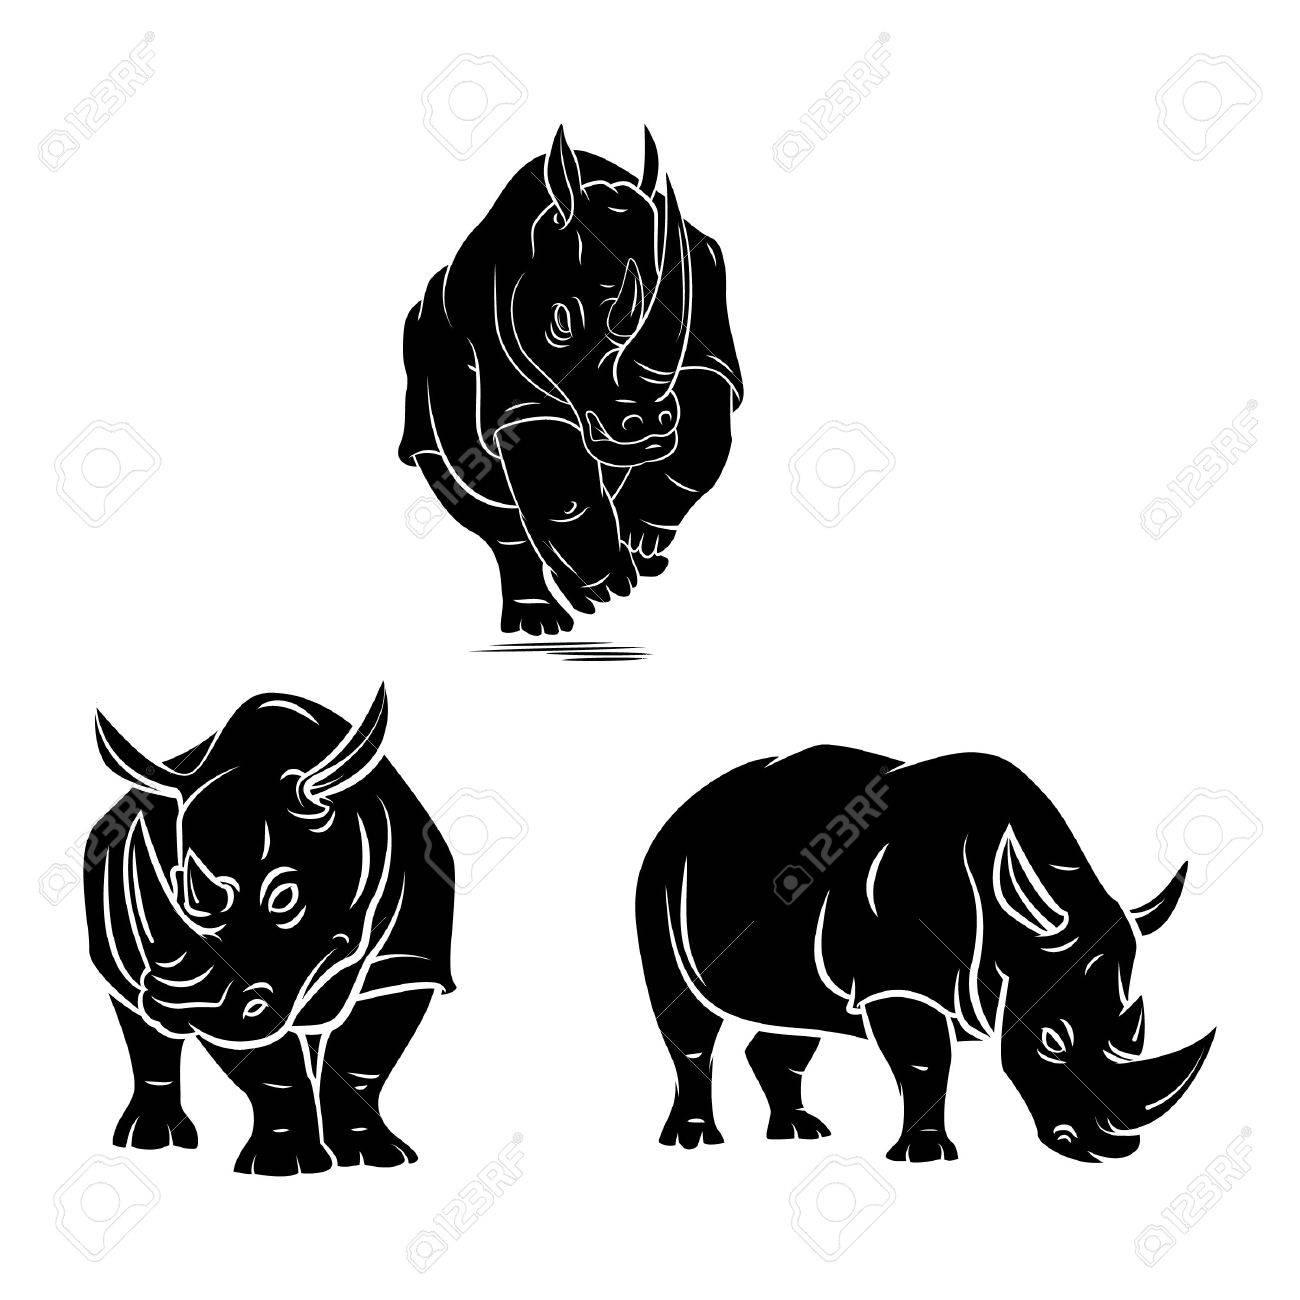 rhino tattoo - 37214528